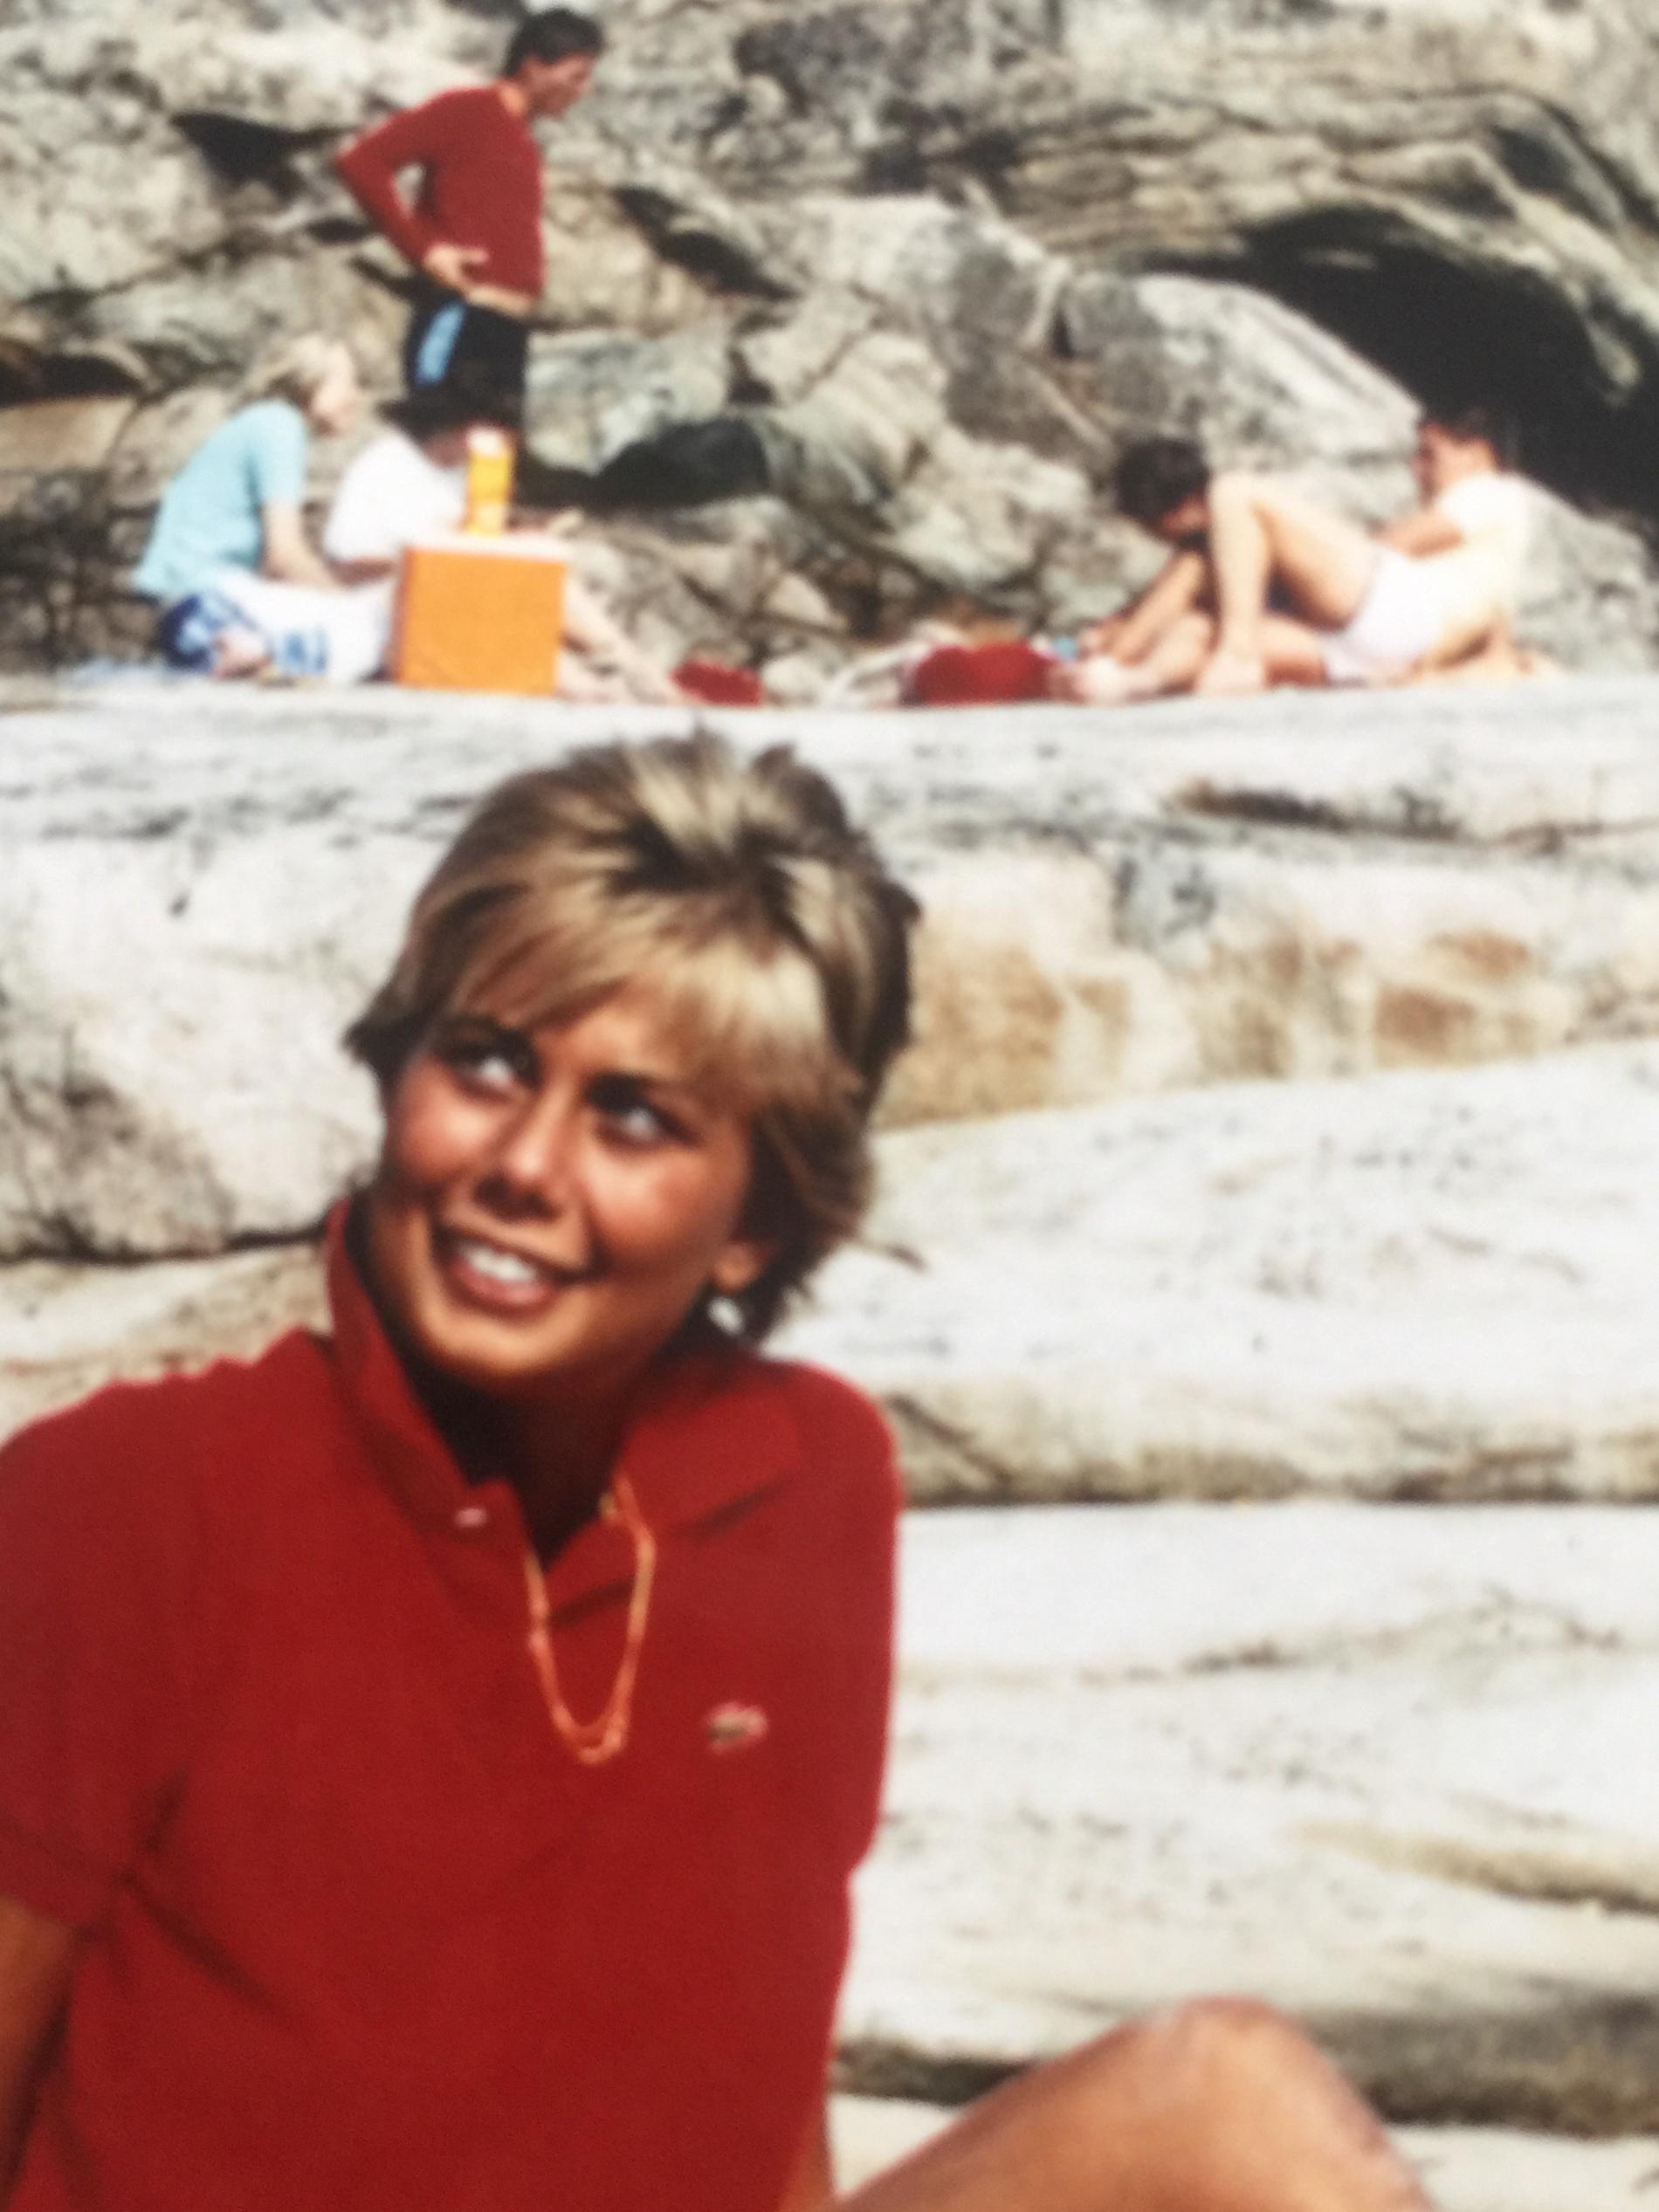 Me at Ramsvik, West Coast of Sweden, 1982